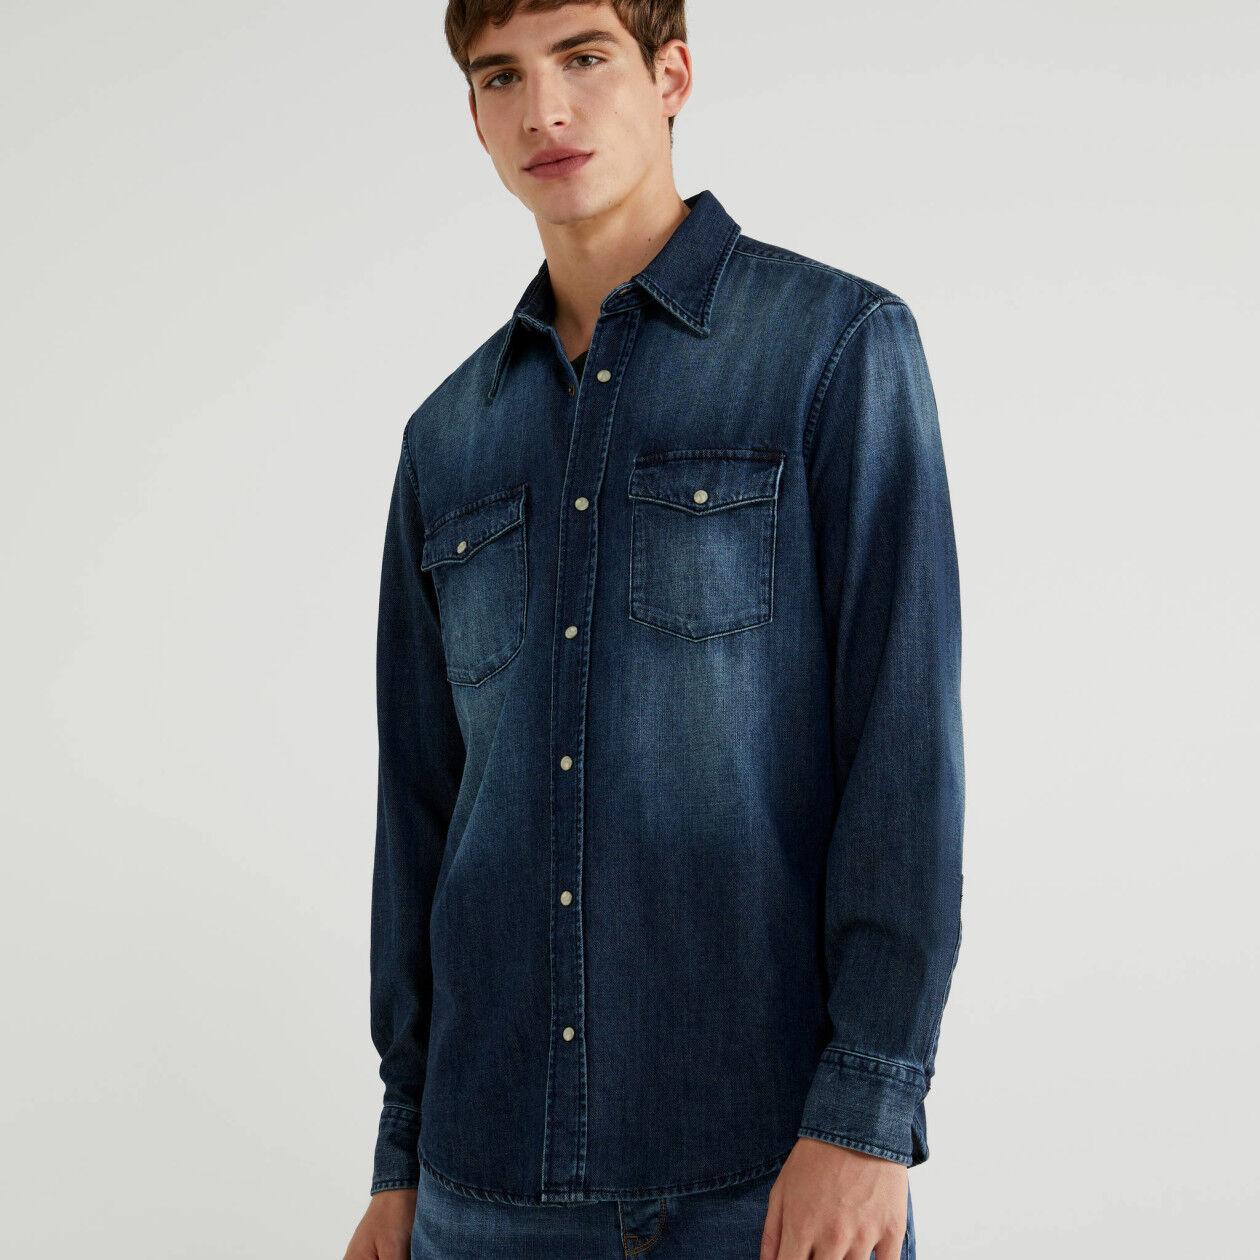 Regular fit denim shirt